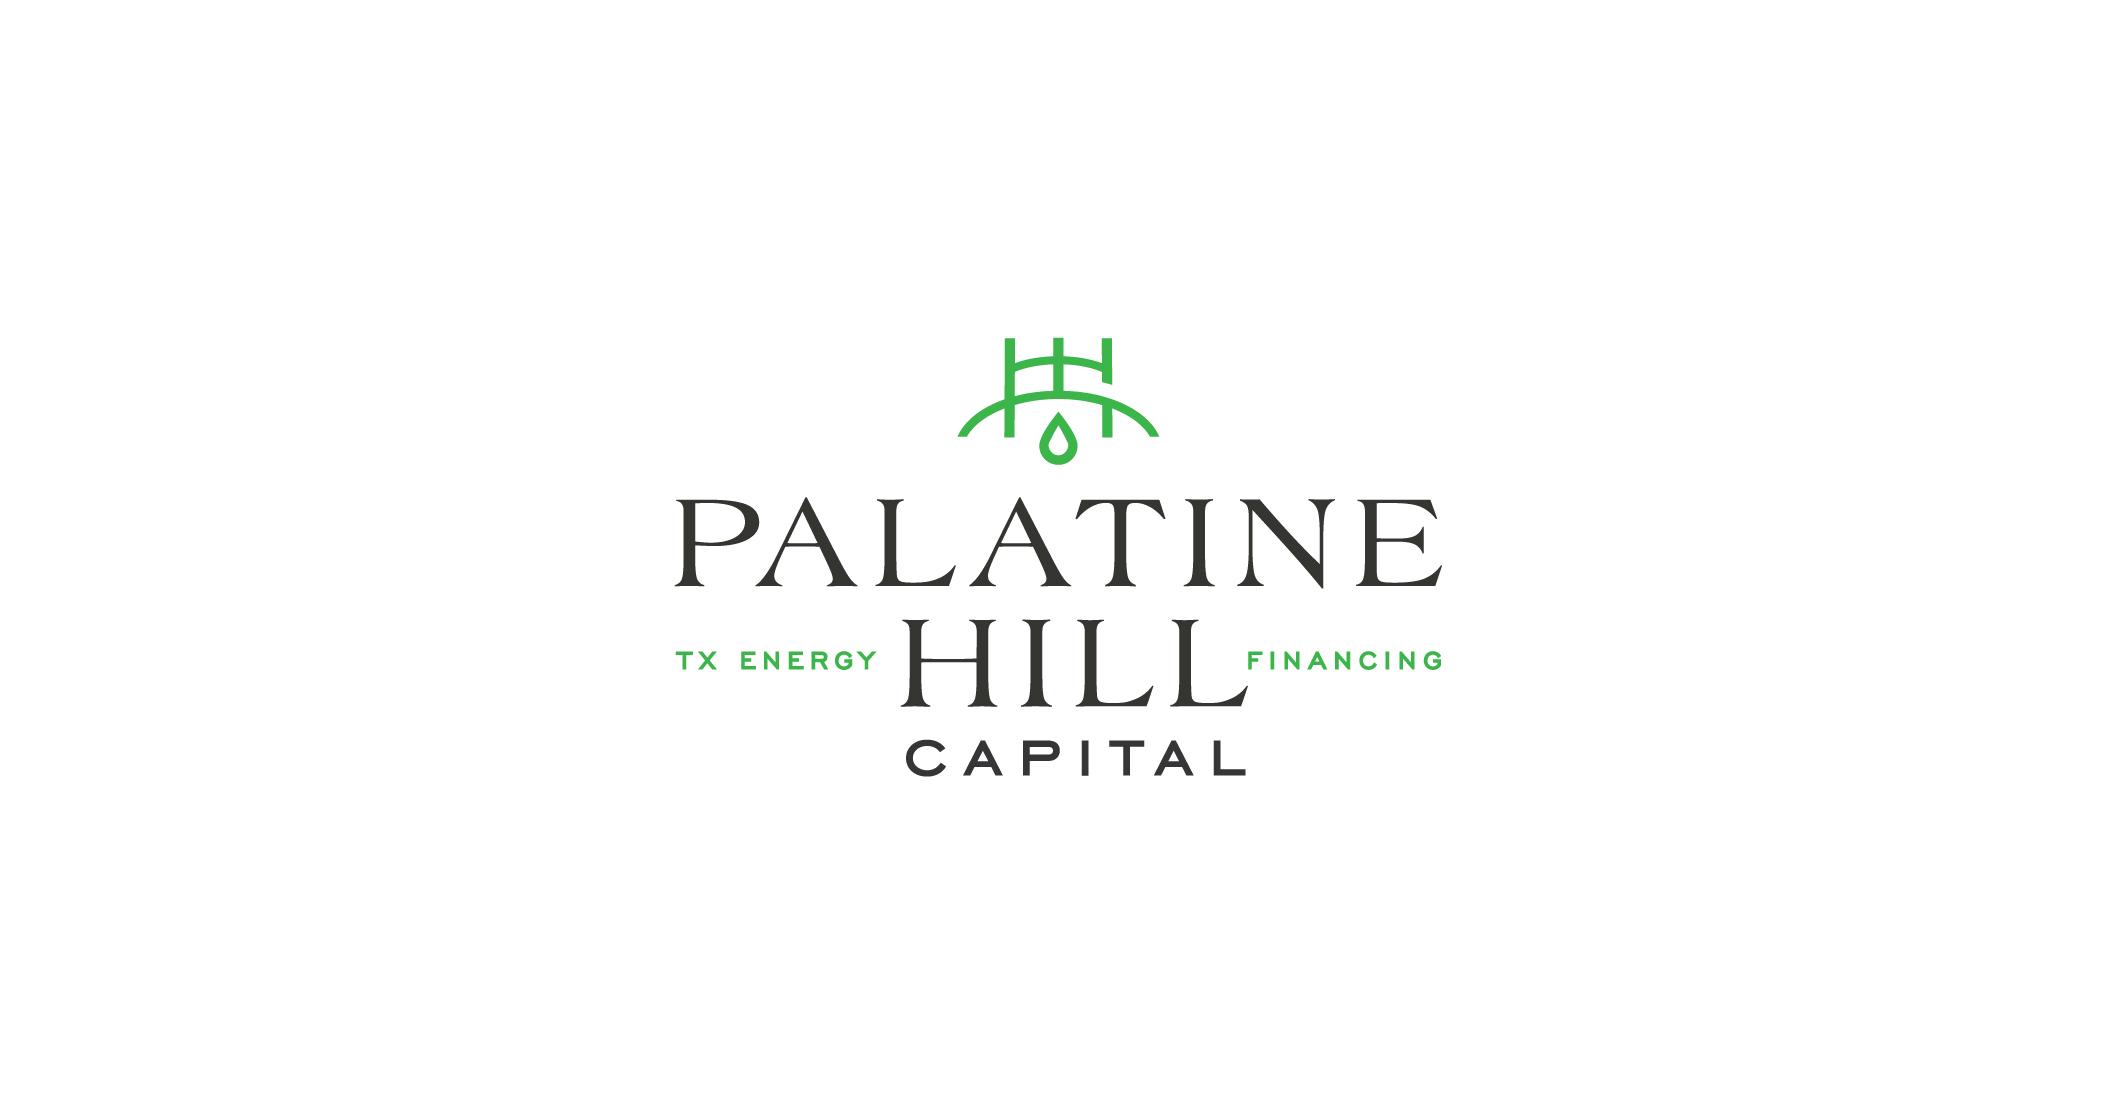 Palatine Hill Capital